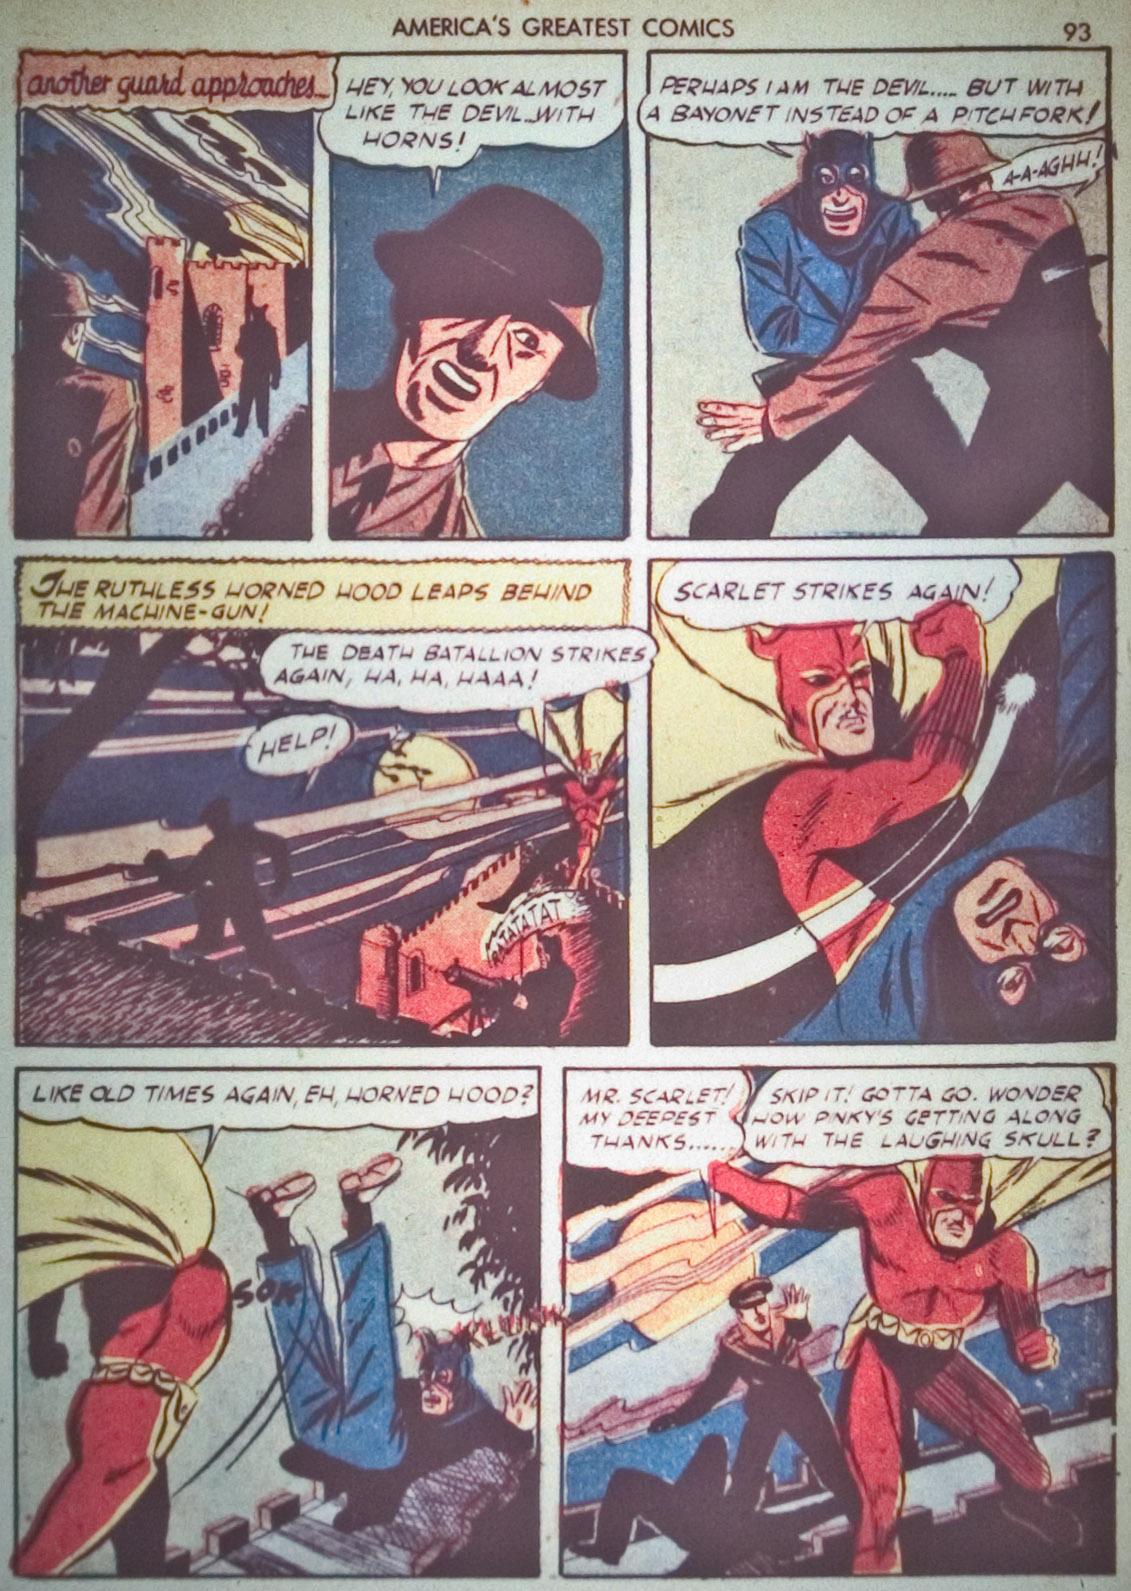 Read online America's Greatest Comics comic -  Issue #1 - 96